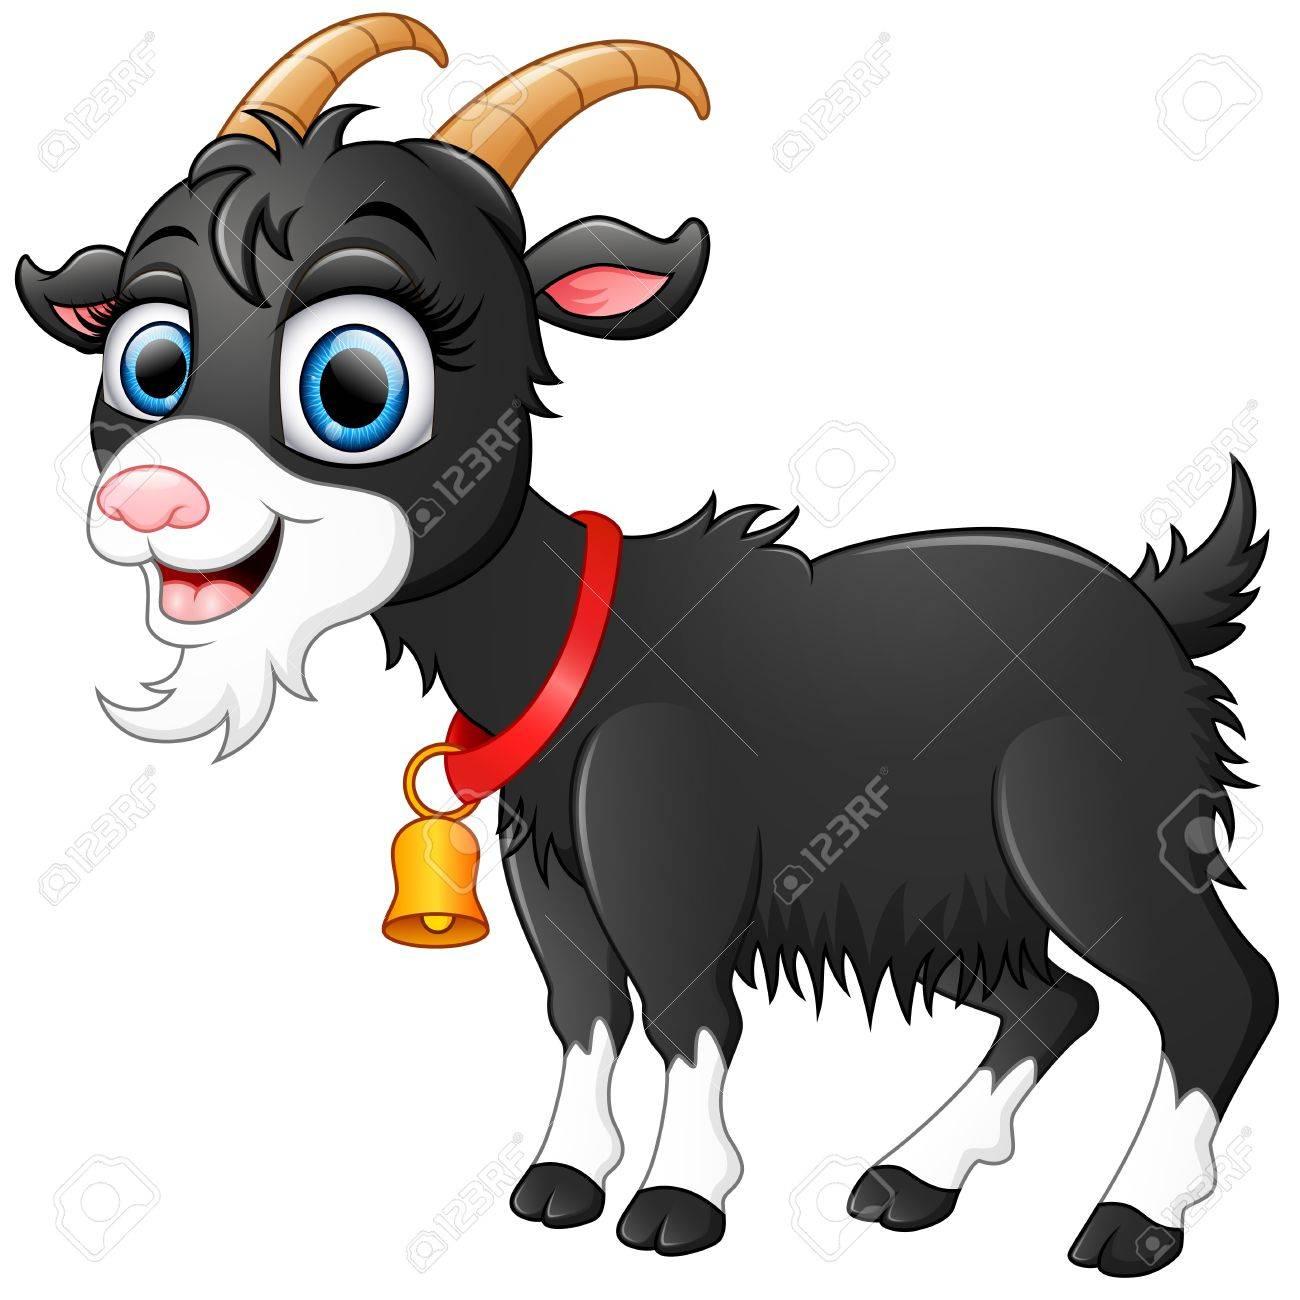 1300x1300 Mesmerizing Goat Pictures Cartoon 29 63781288 Cute Black Paper